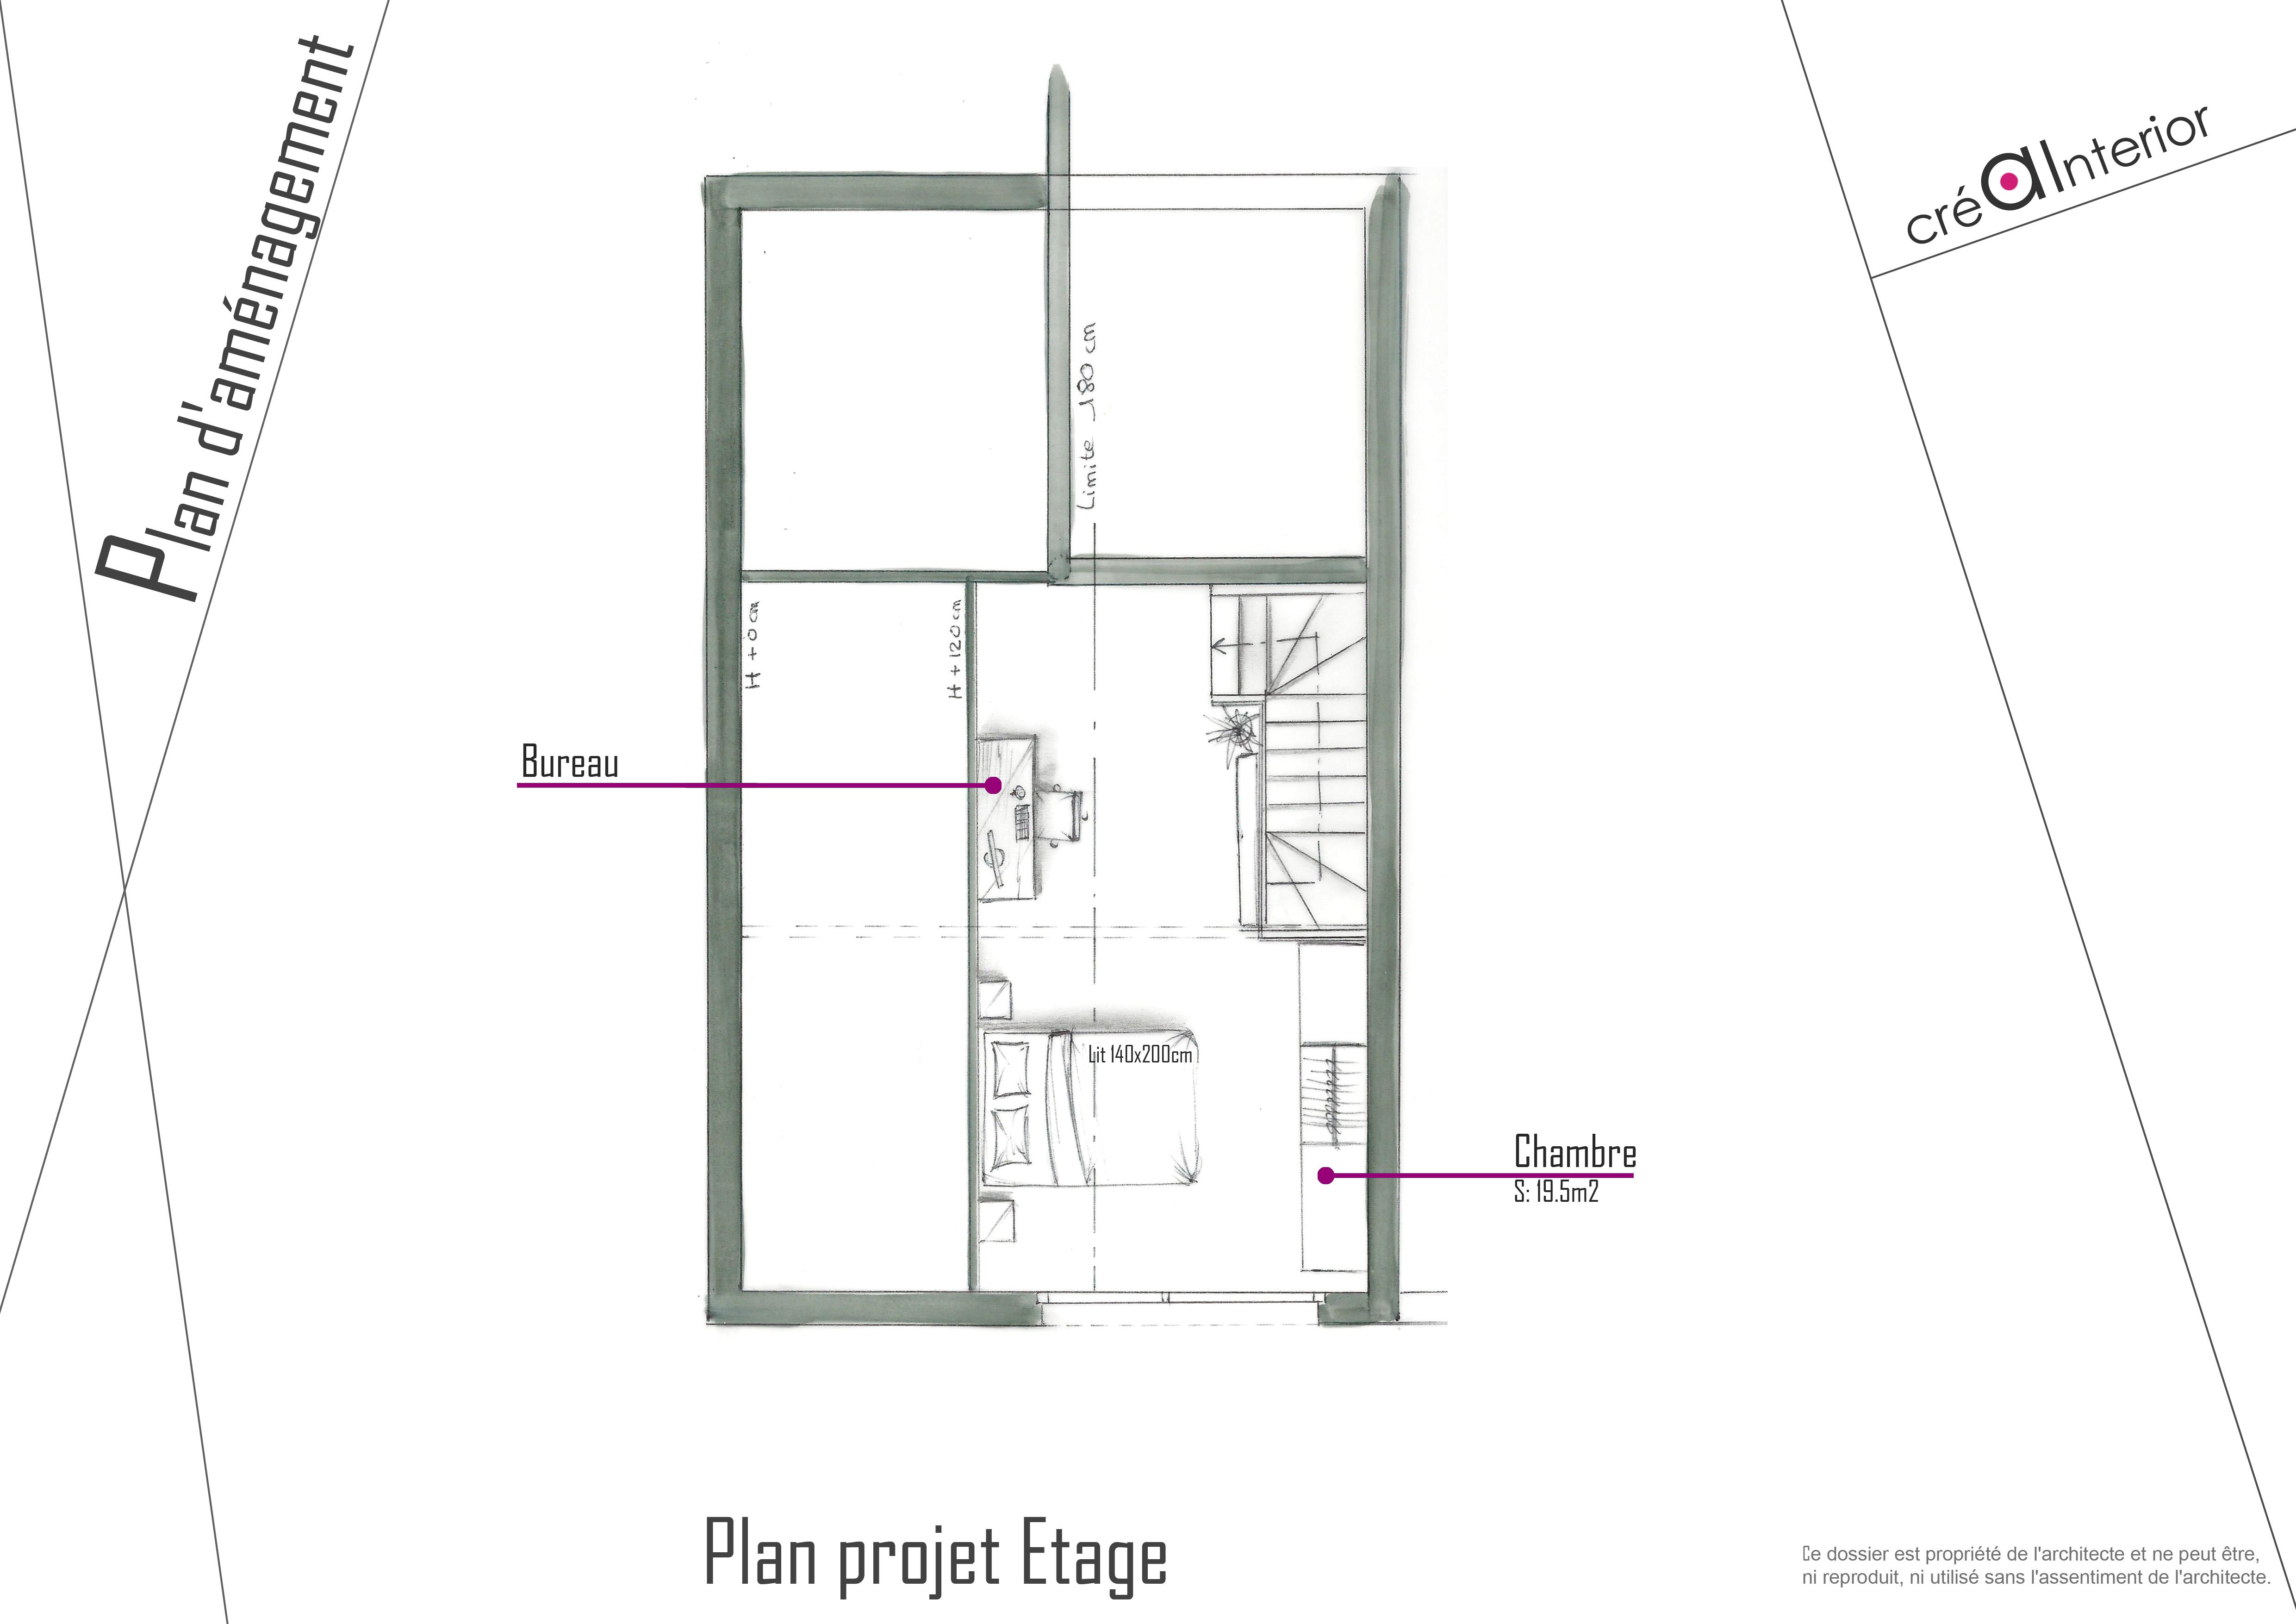 Plan projet Etage